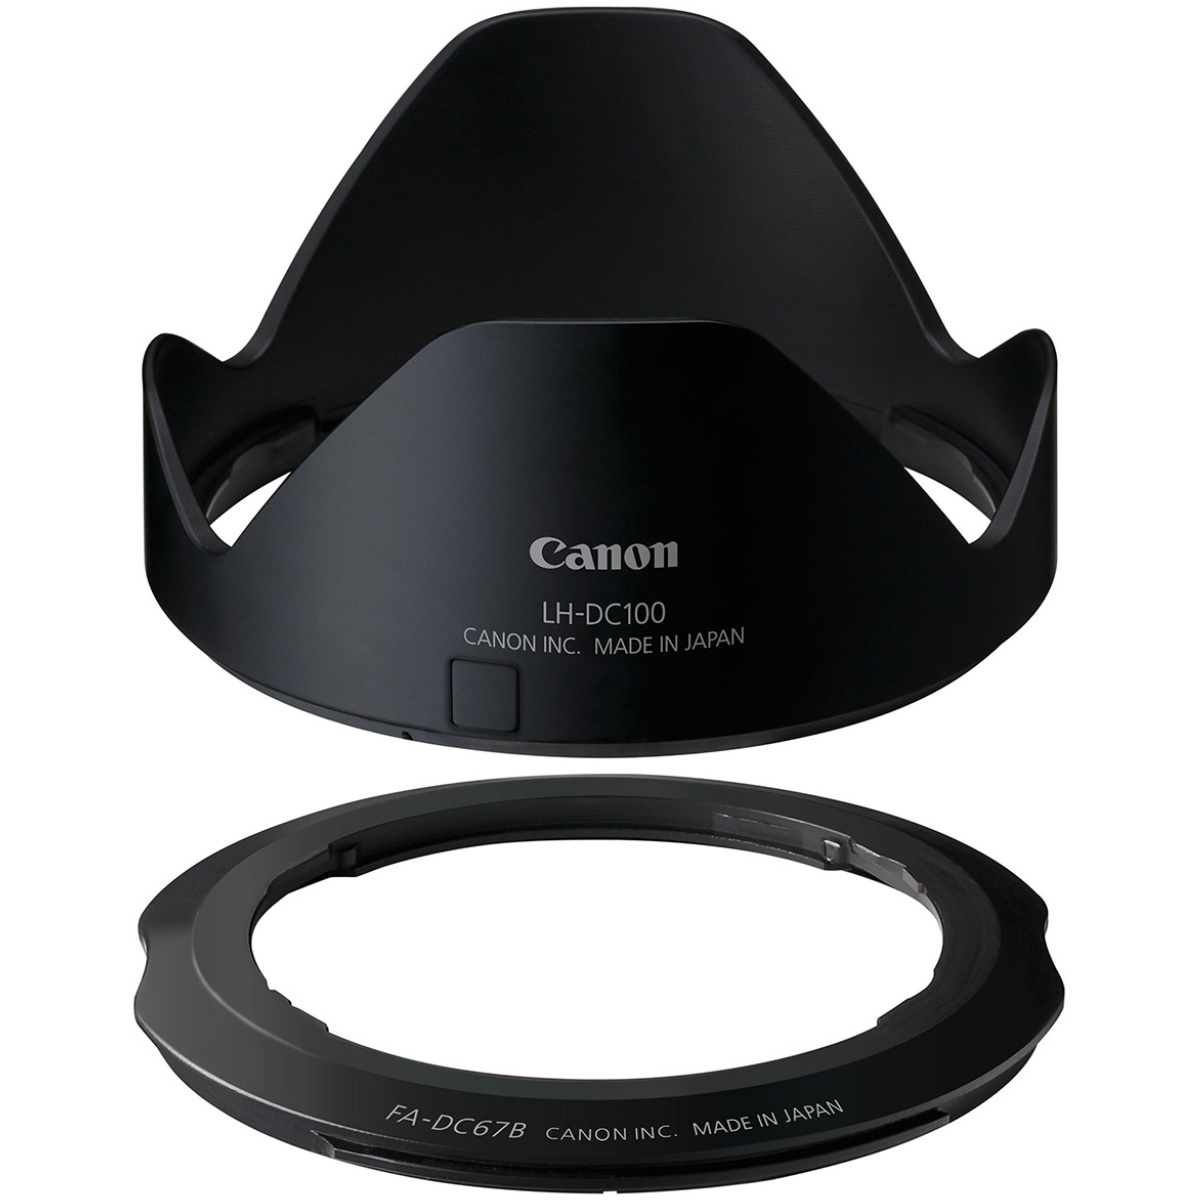 Canon LH-DC100 Gegenlichtblende + FA-DC67B Adapter